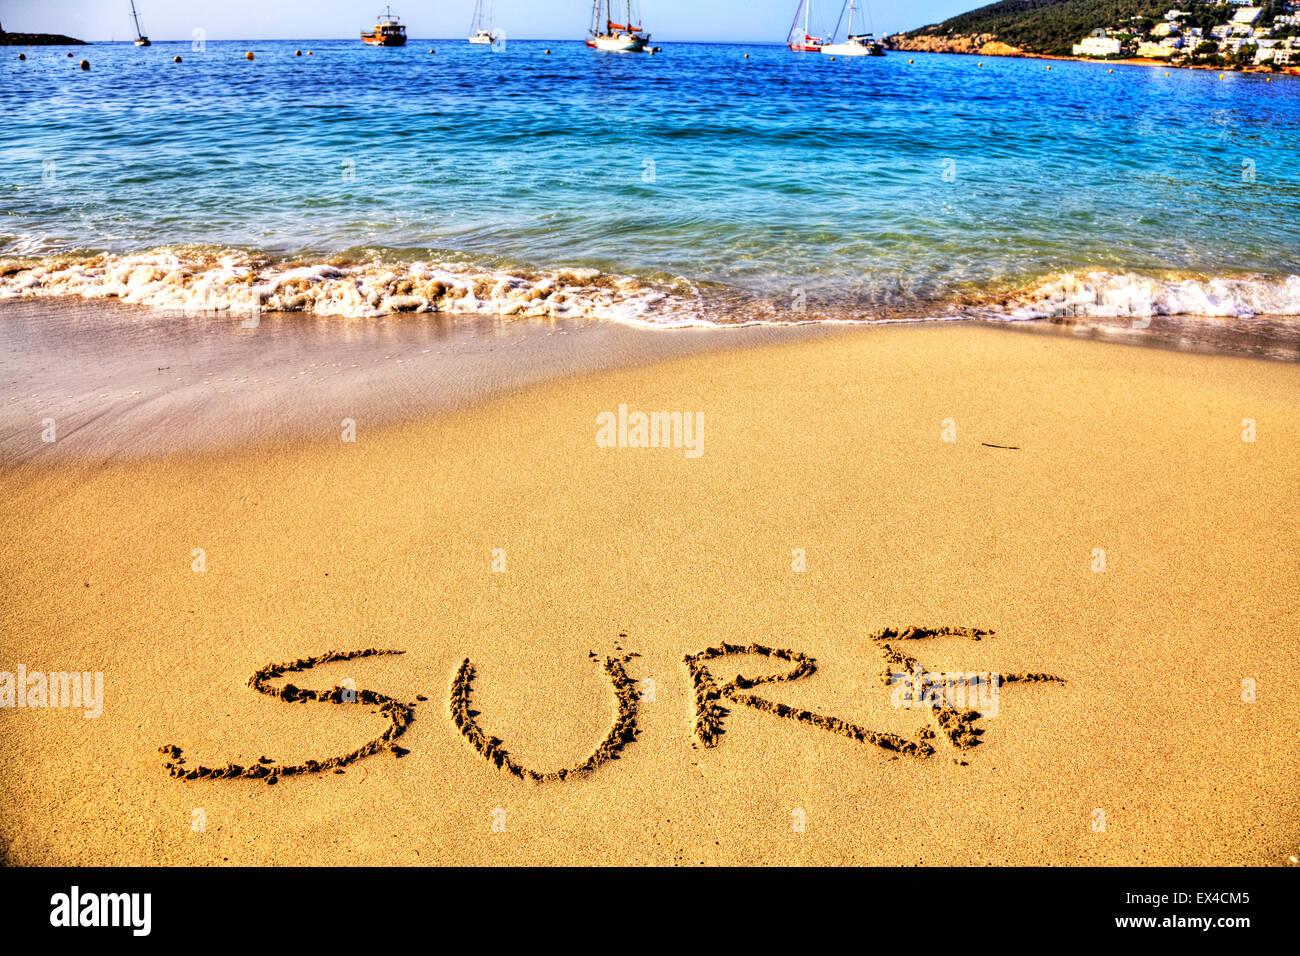 Surf word in sand written on beach Spanish fun resort seas coast coastlines holidays vacations trips trip getaway - Stock Image